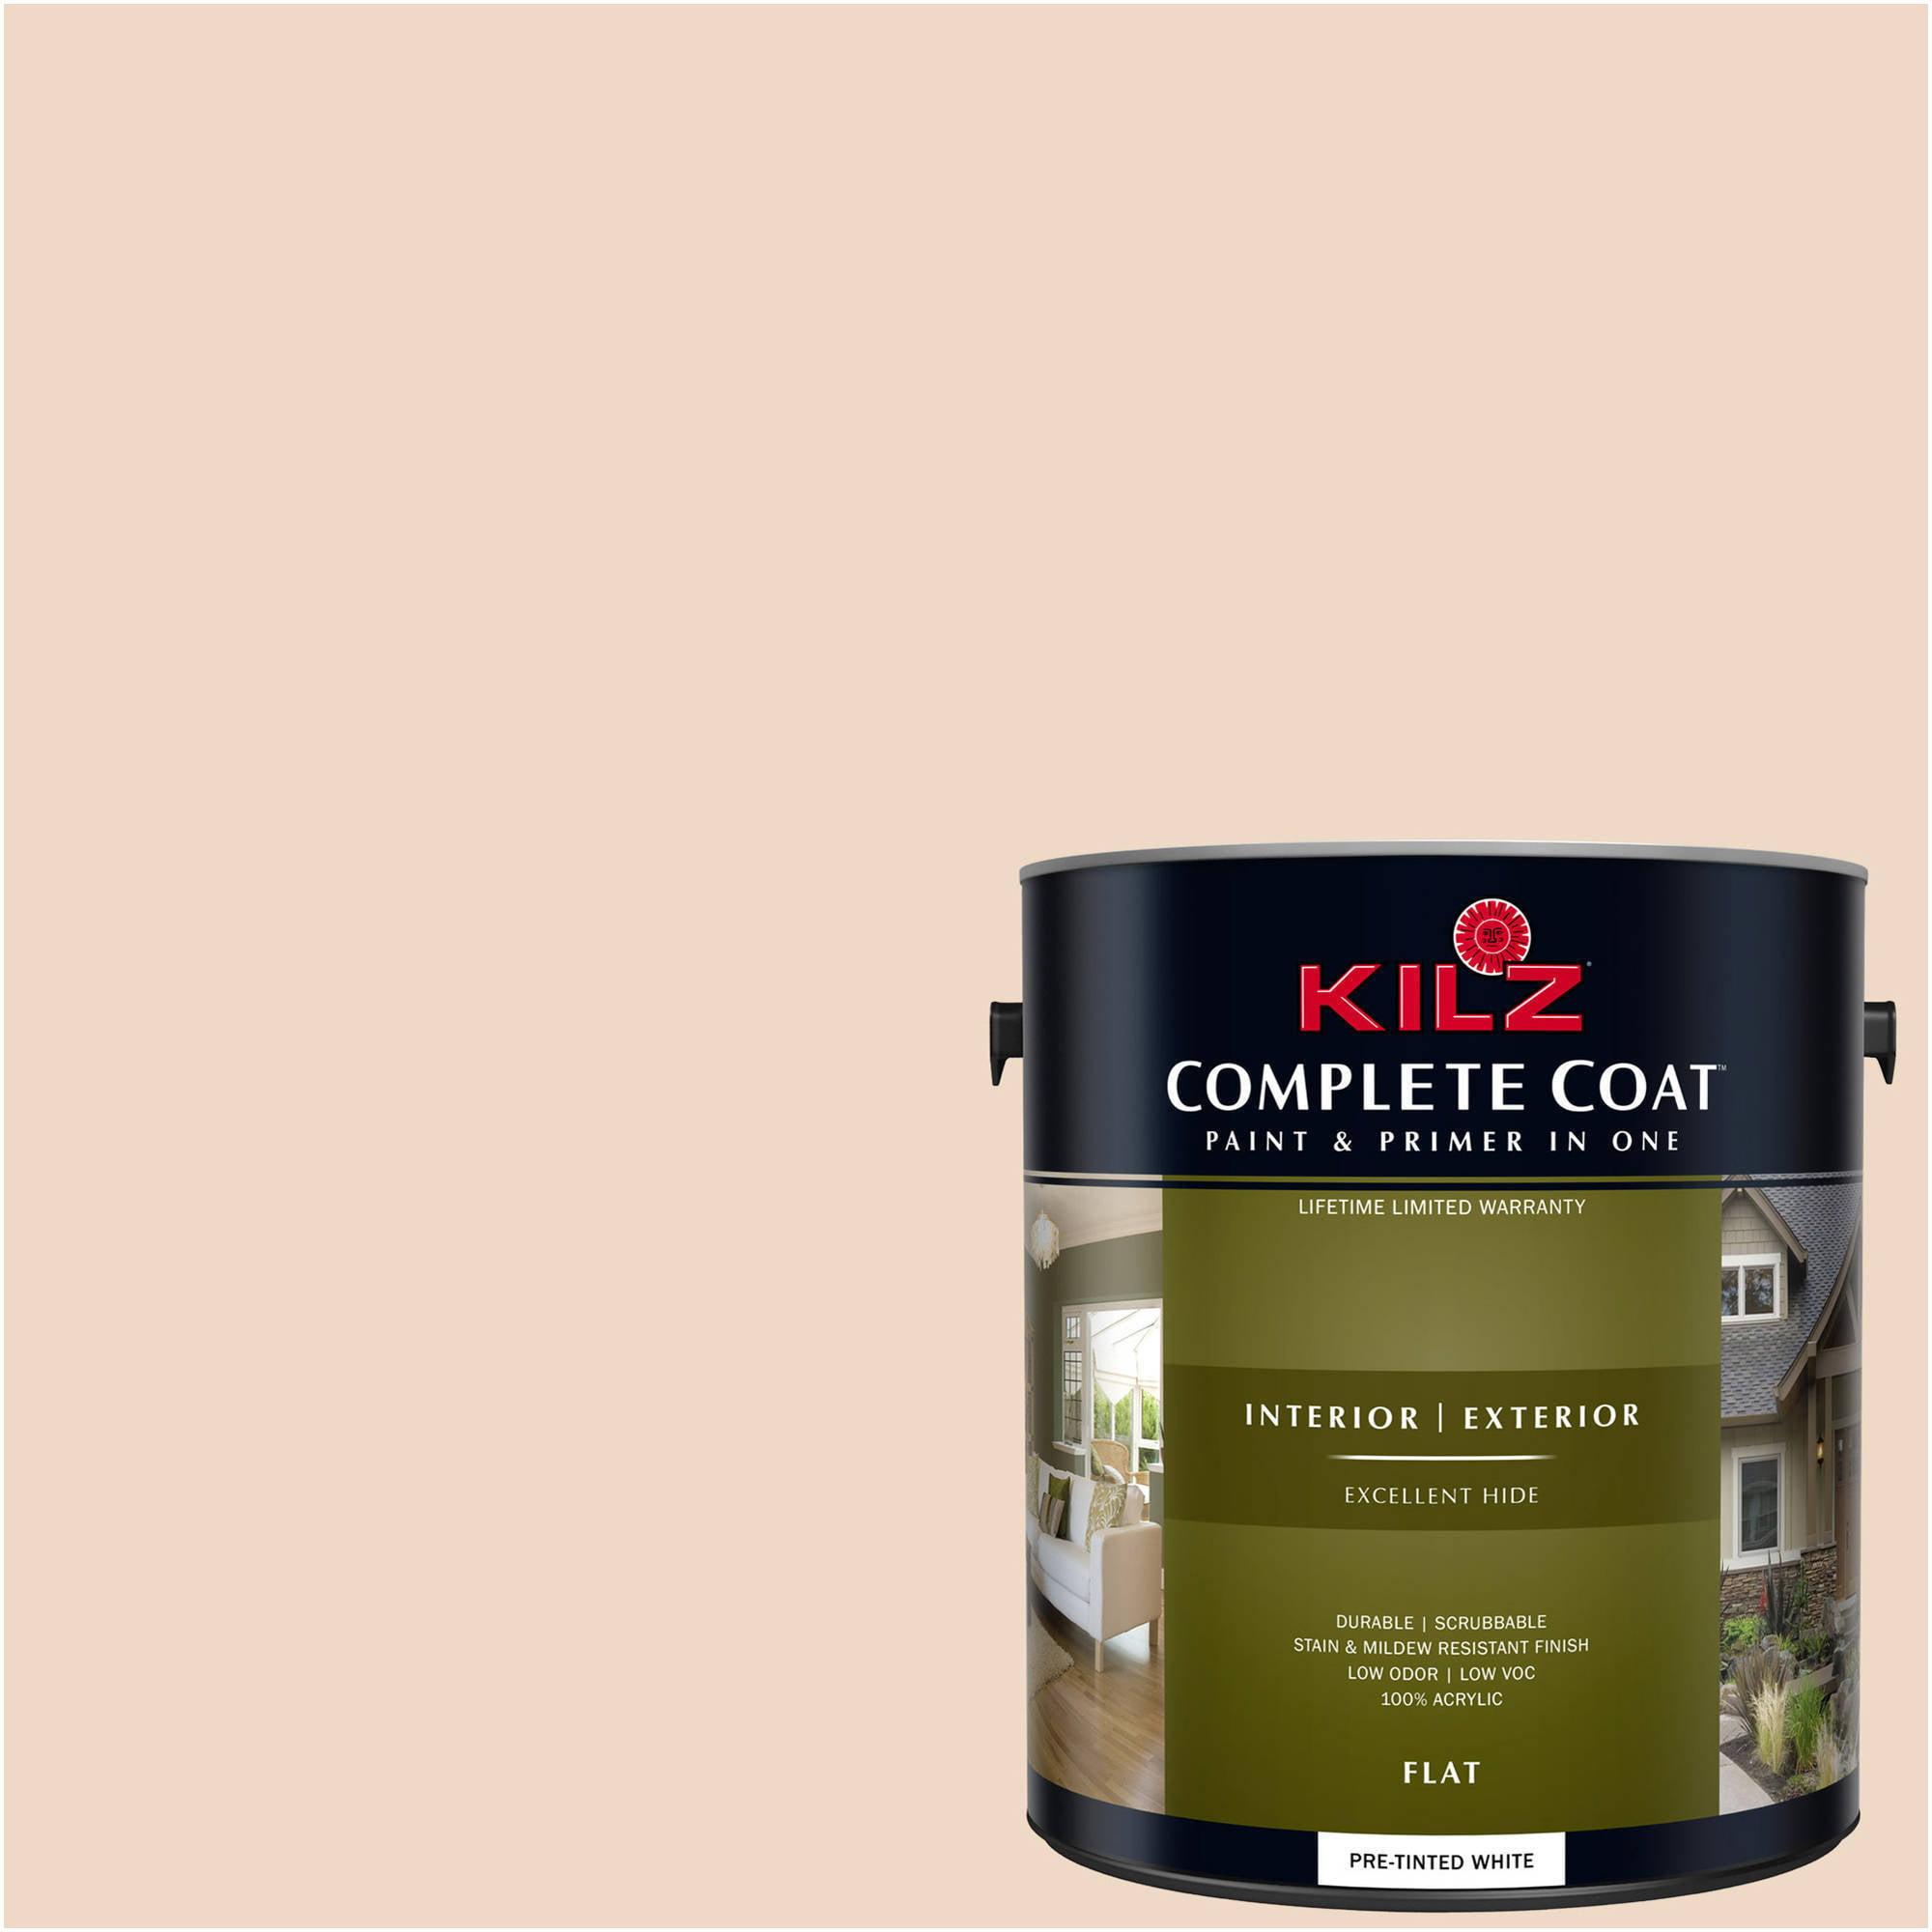 KILZ COMPLETE COAT Interior/Exterior Paint & Primer in One #LJ110 Almond Cake